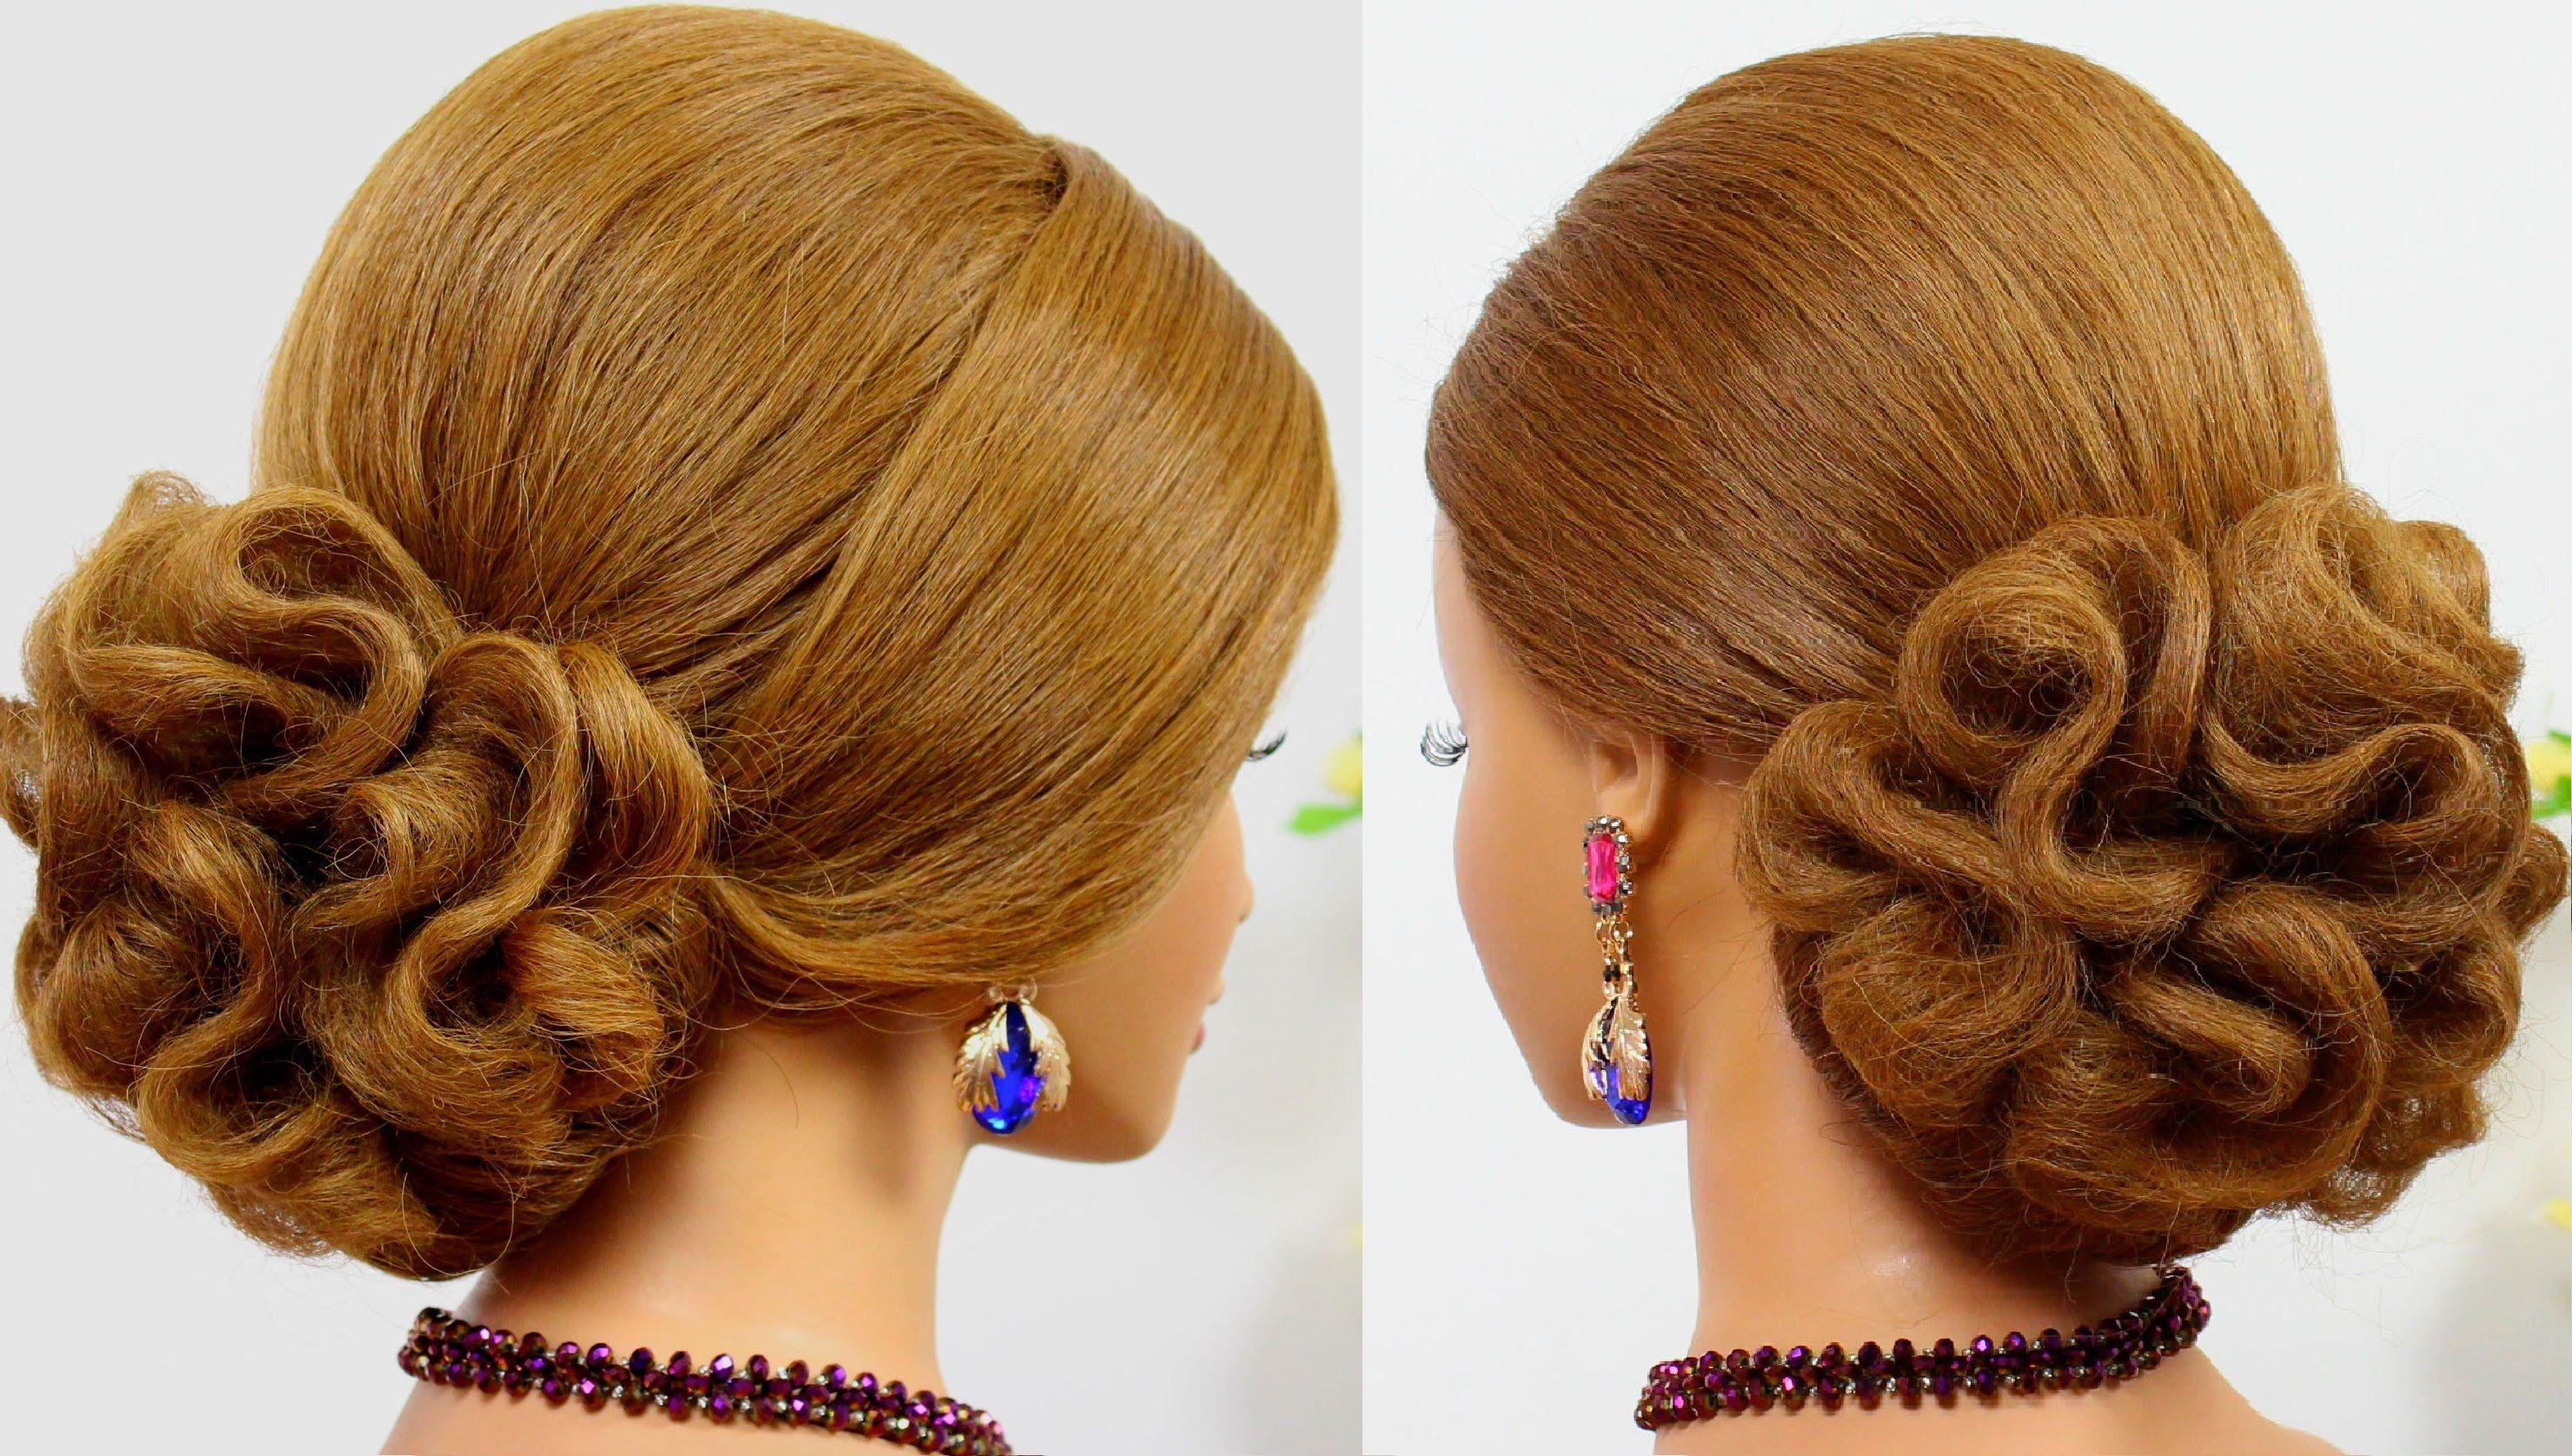 Updo Hairstyles Wedding Prom Hairstyles For Medium Hair Bridal Hairstyles Hair Tutorial Prom Hair Medium Medium Hair Styles